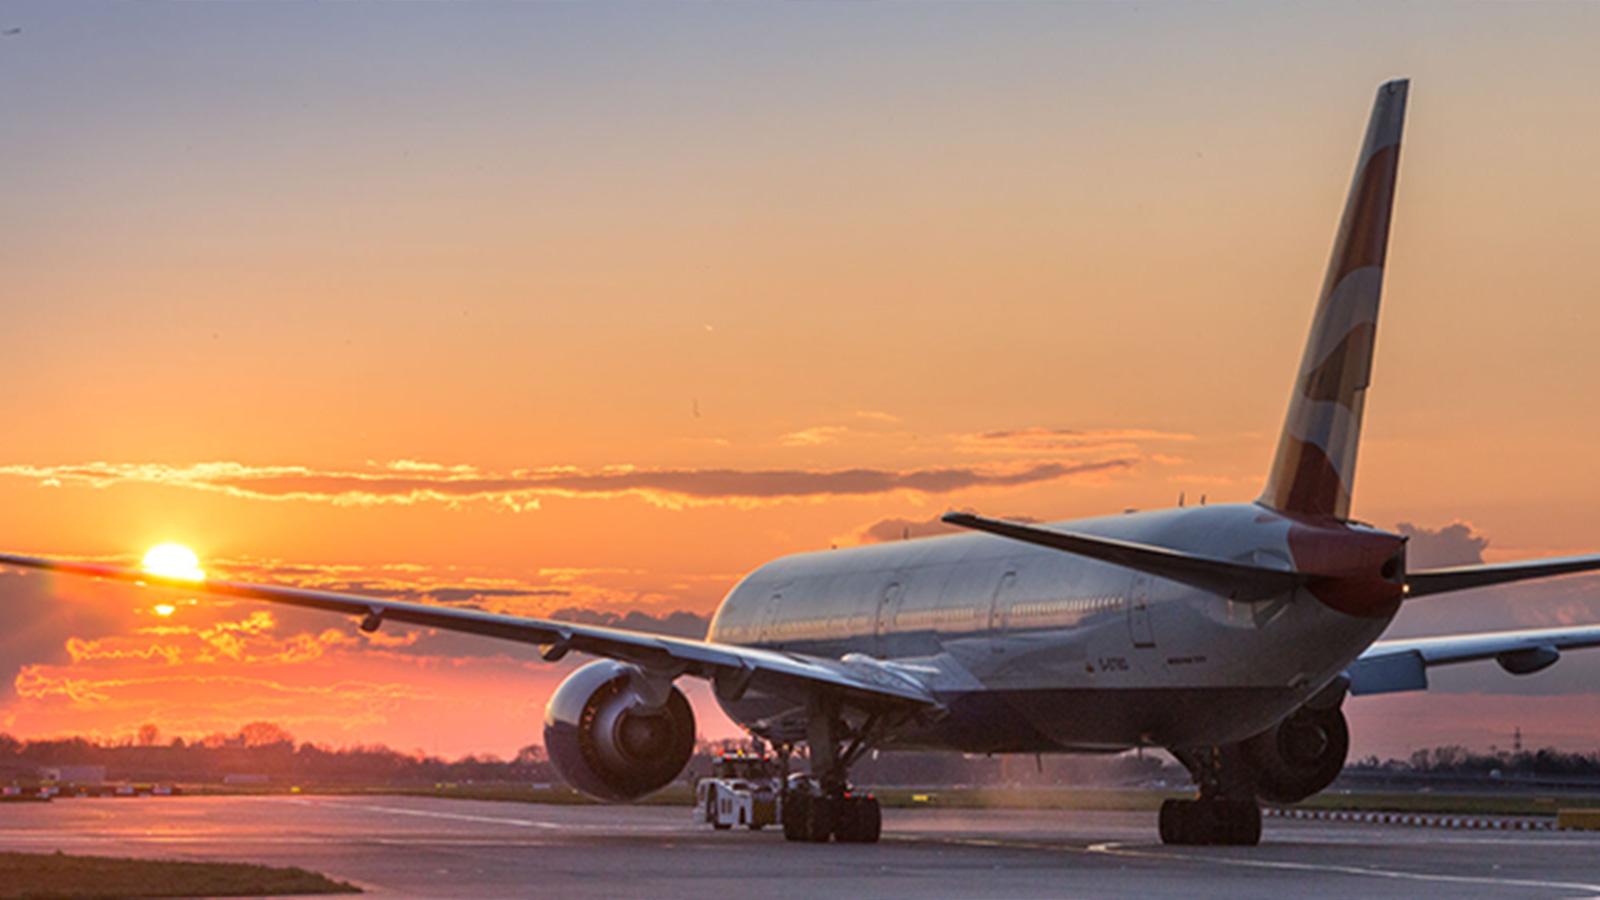 Sunset at London Heathrow Airport - Mace Group